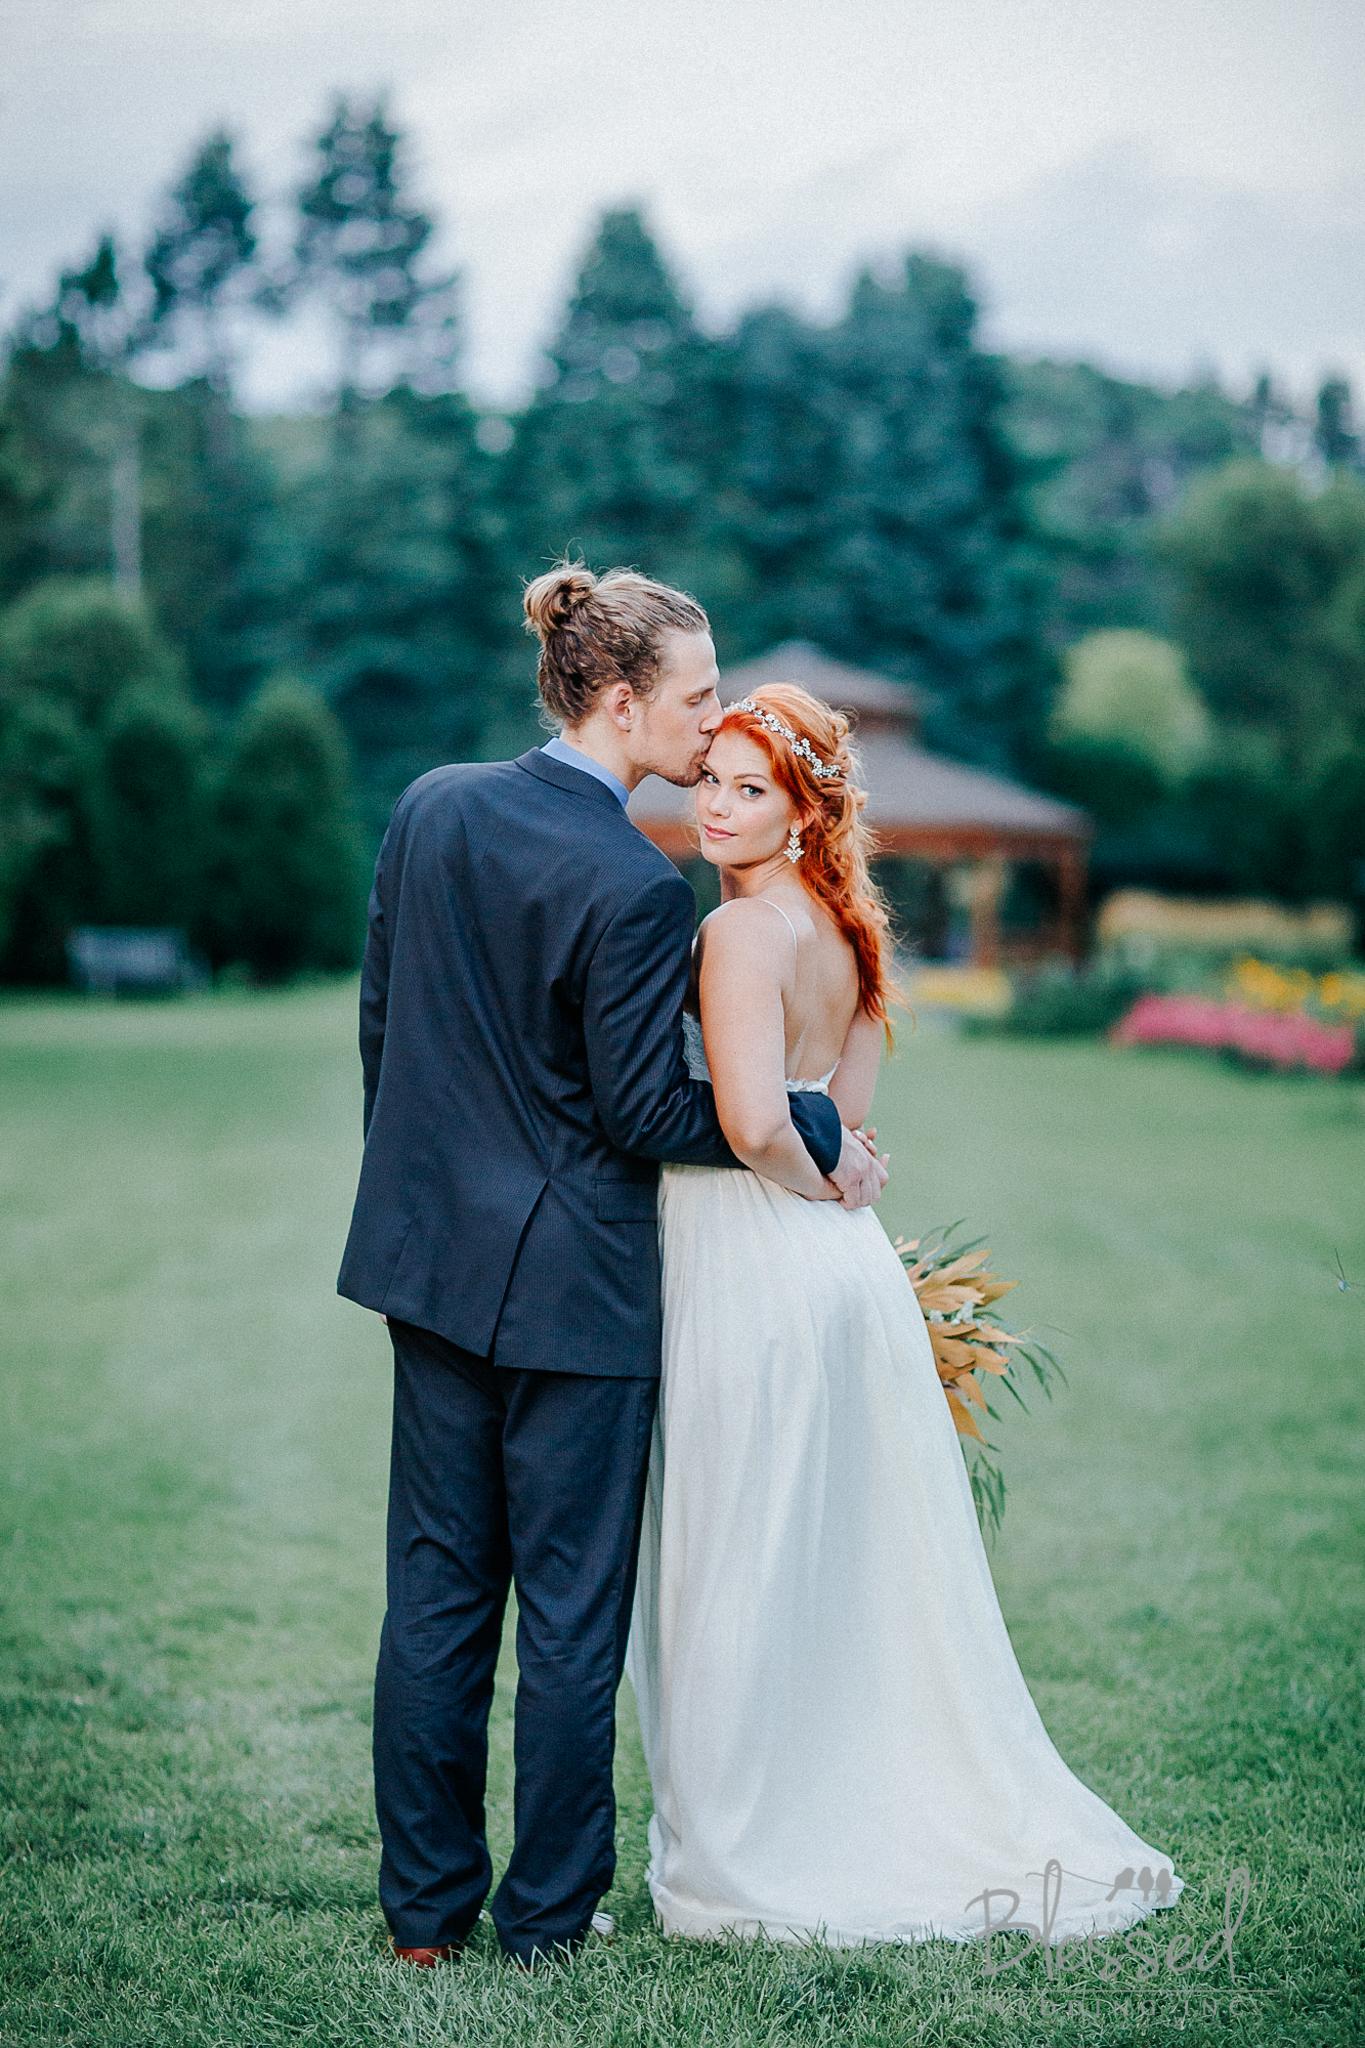 Destination Wedding Photography Minnesota By Blessed Wedding Photographers-60.jpg